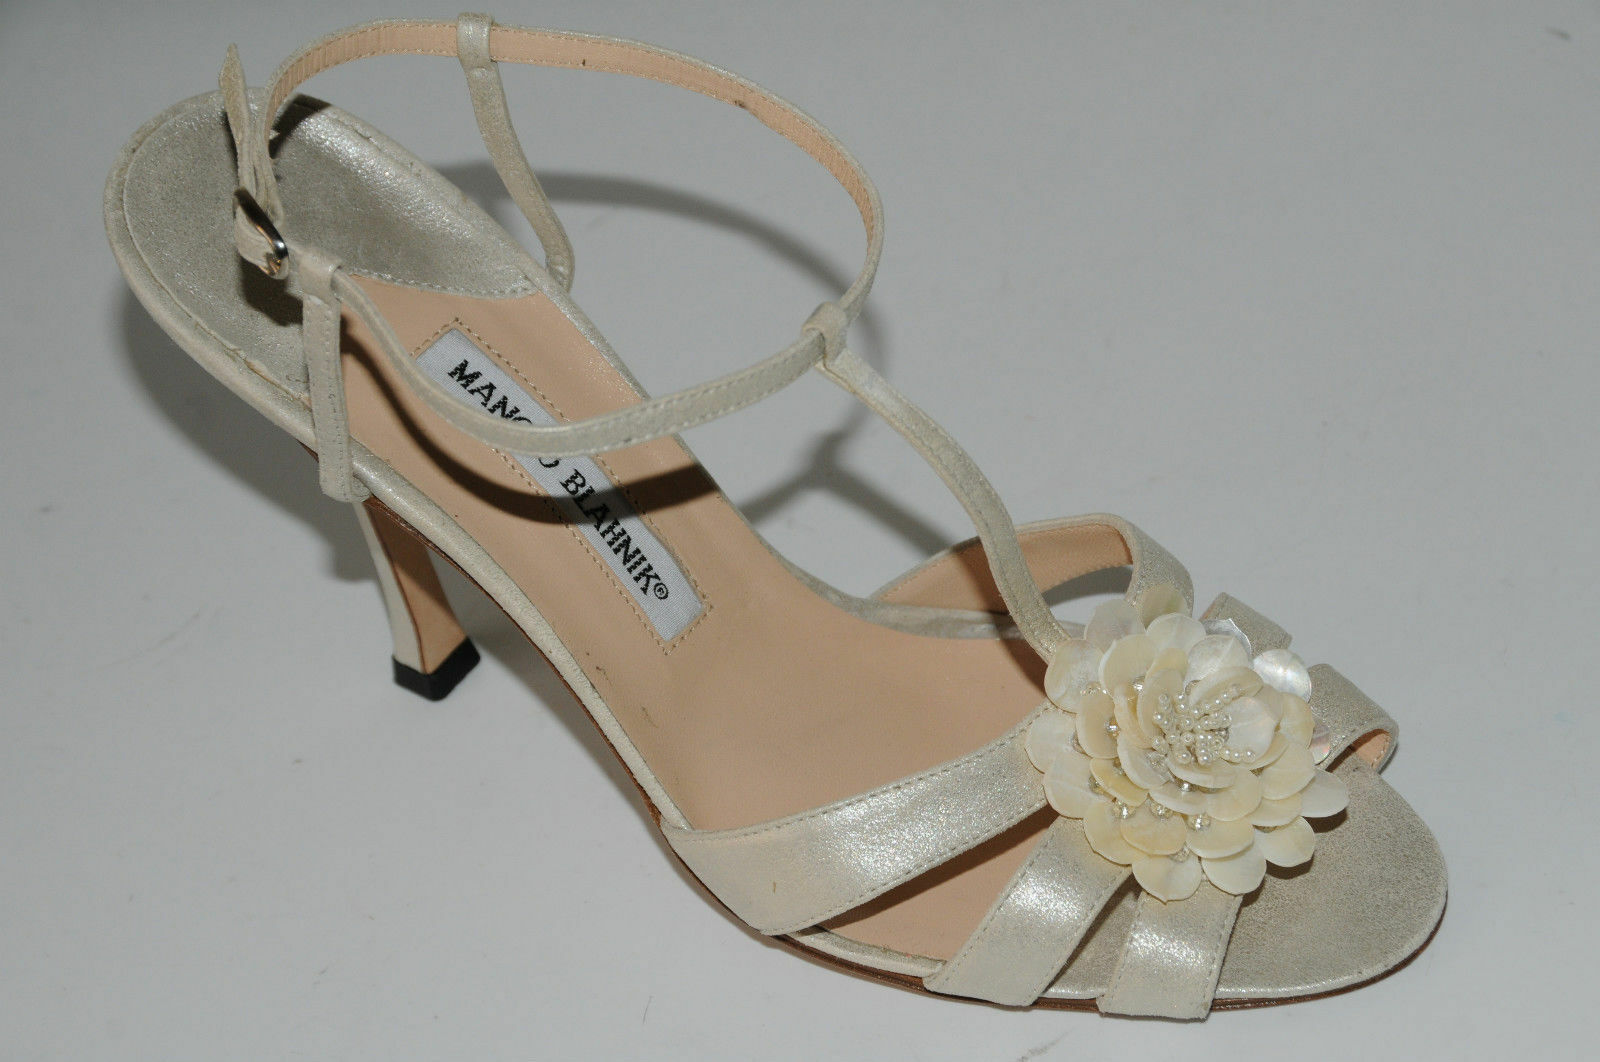 Nuevos Zapatos Sandalias de Manolo Blahnik Putas blancoas Boda Boda Boda Con Tiras De Piedras Preciosas 41.5  a la venta